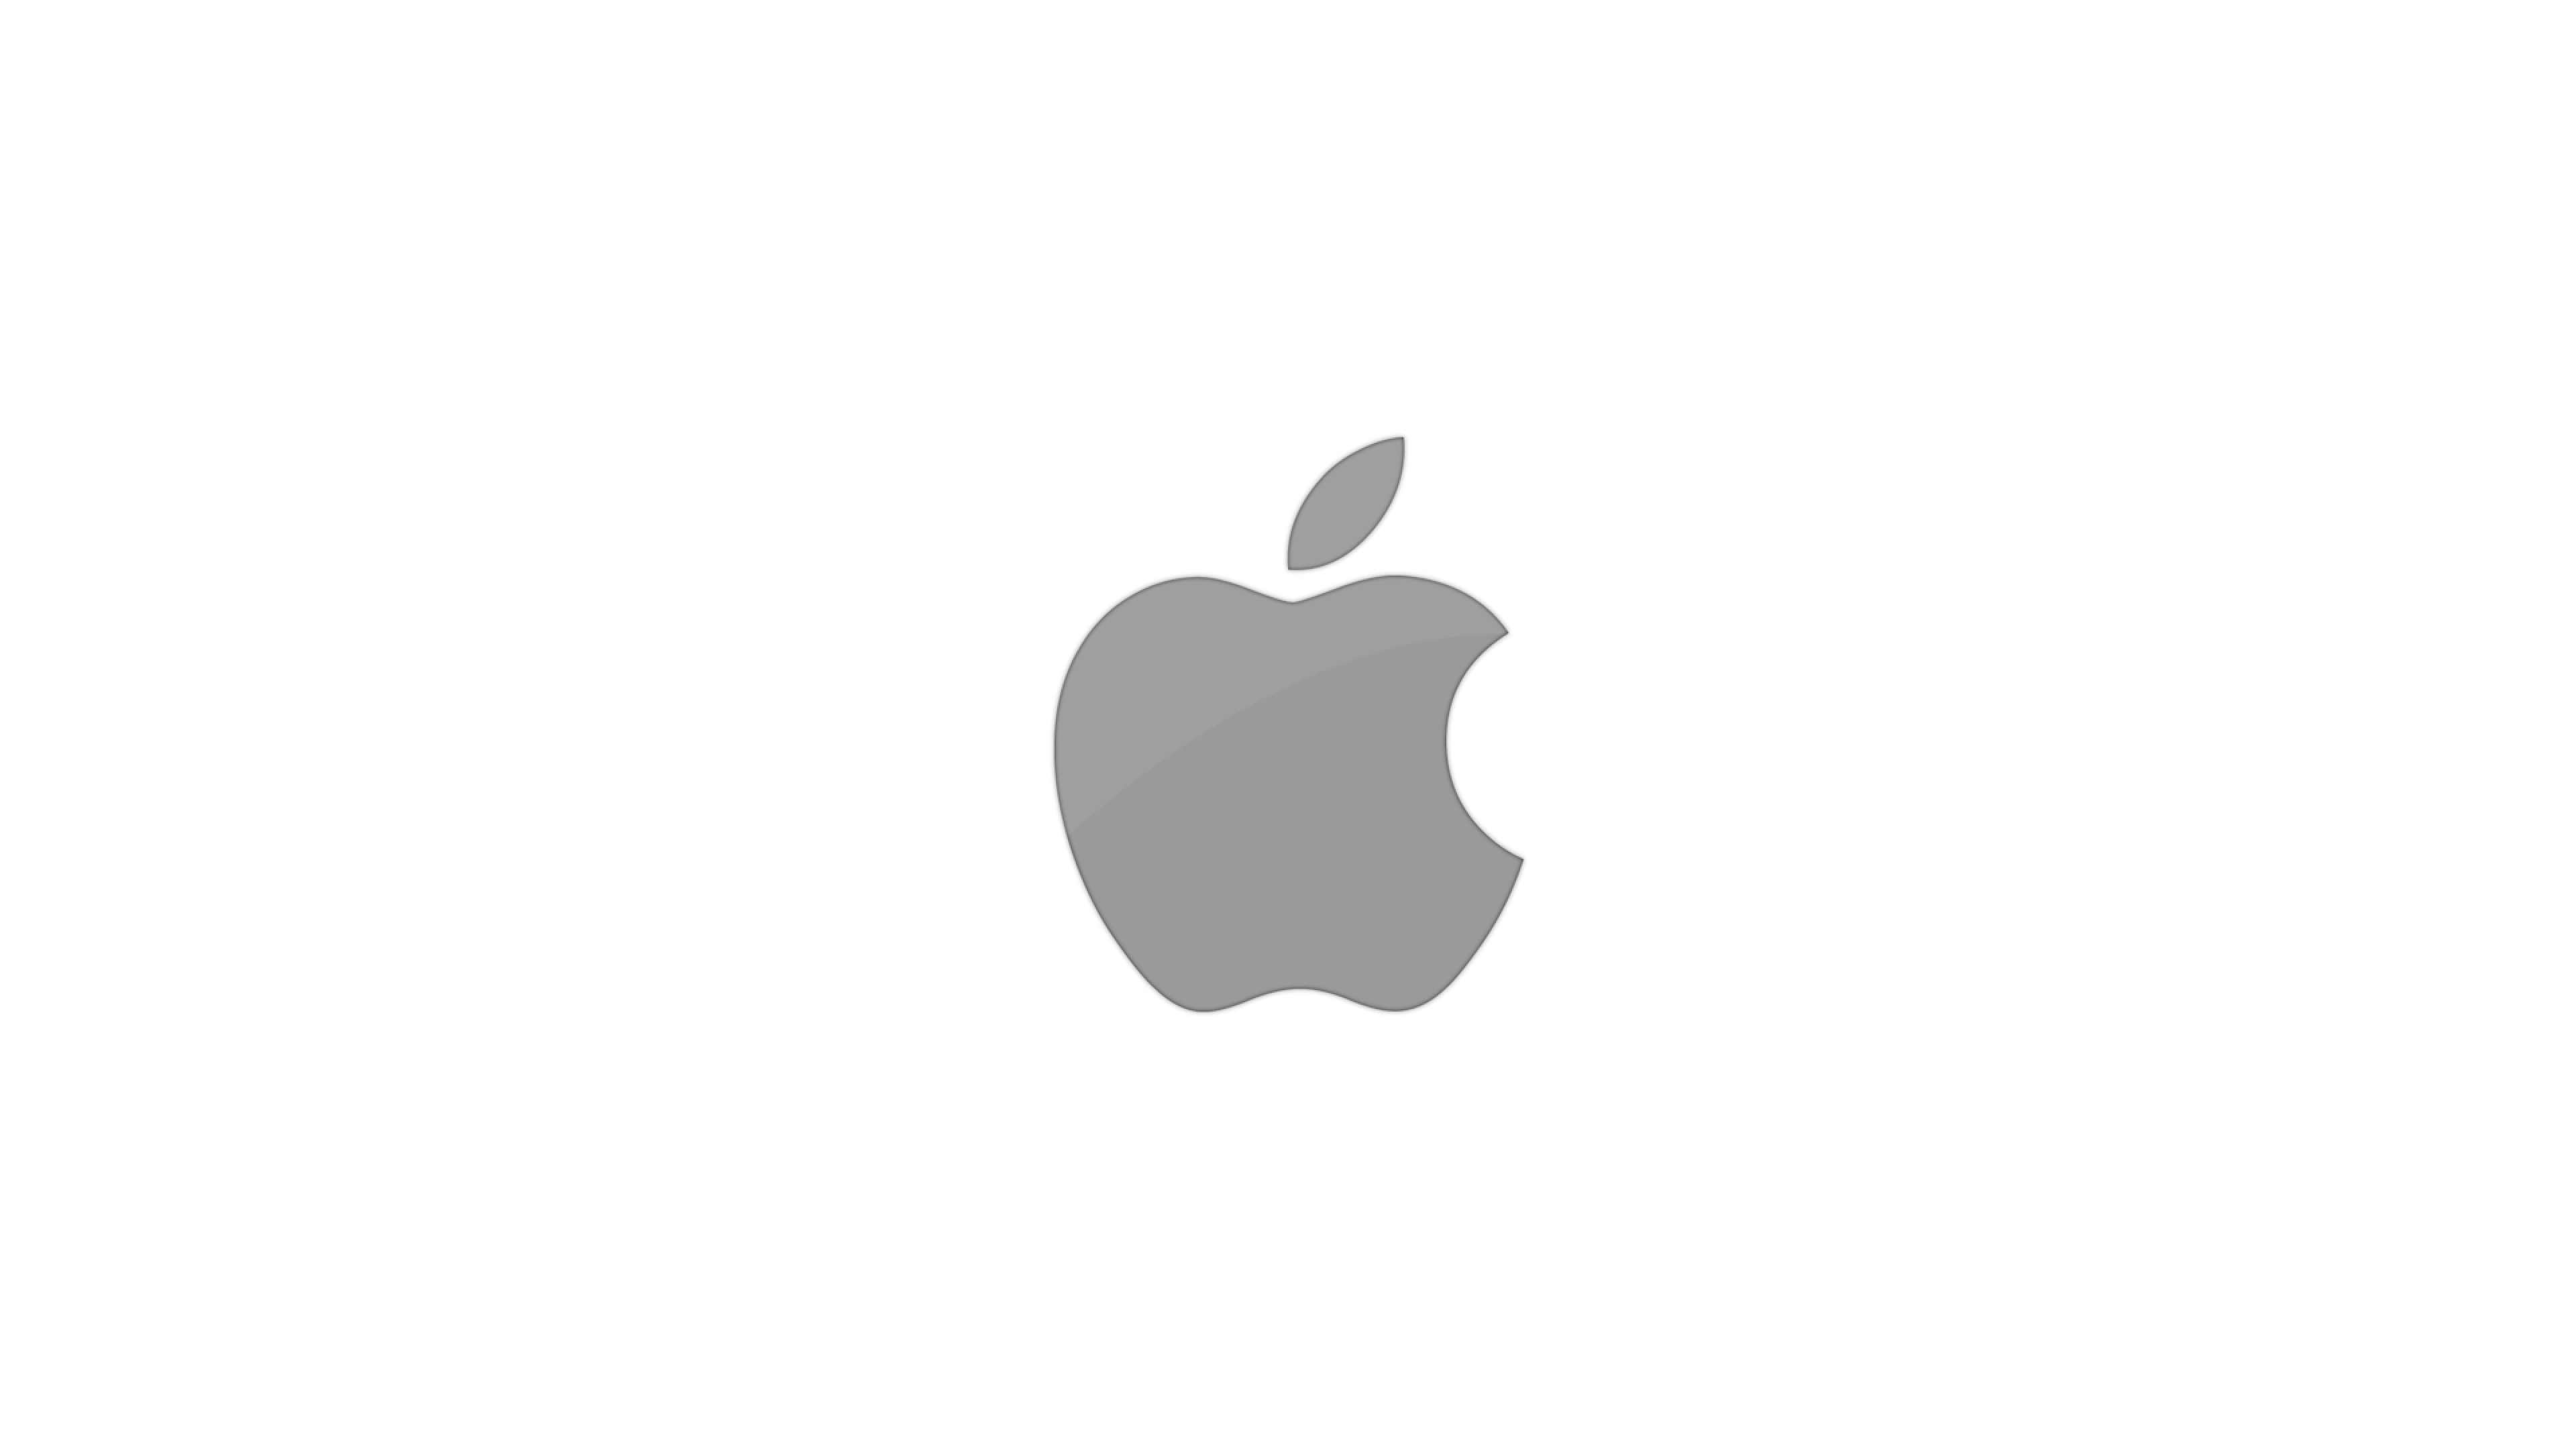 Почему техника Apple настолько дорогая?